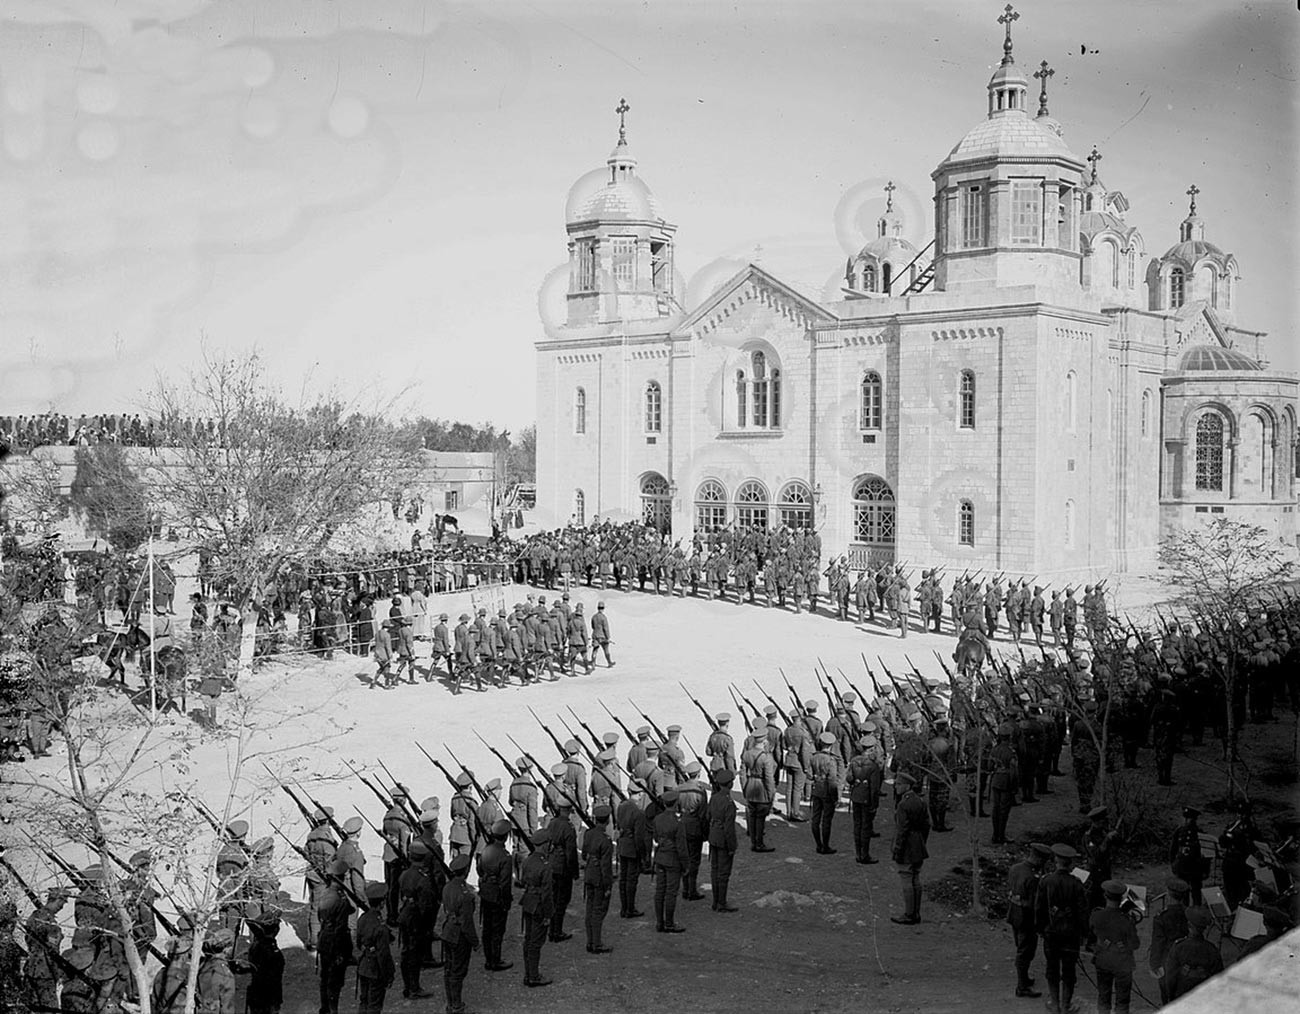 Marcha de Allenby no Complexo Russo, 1917